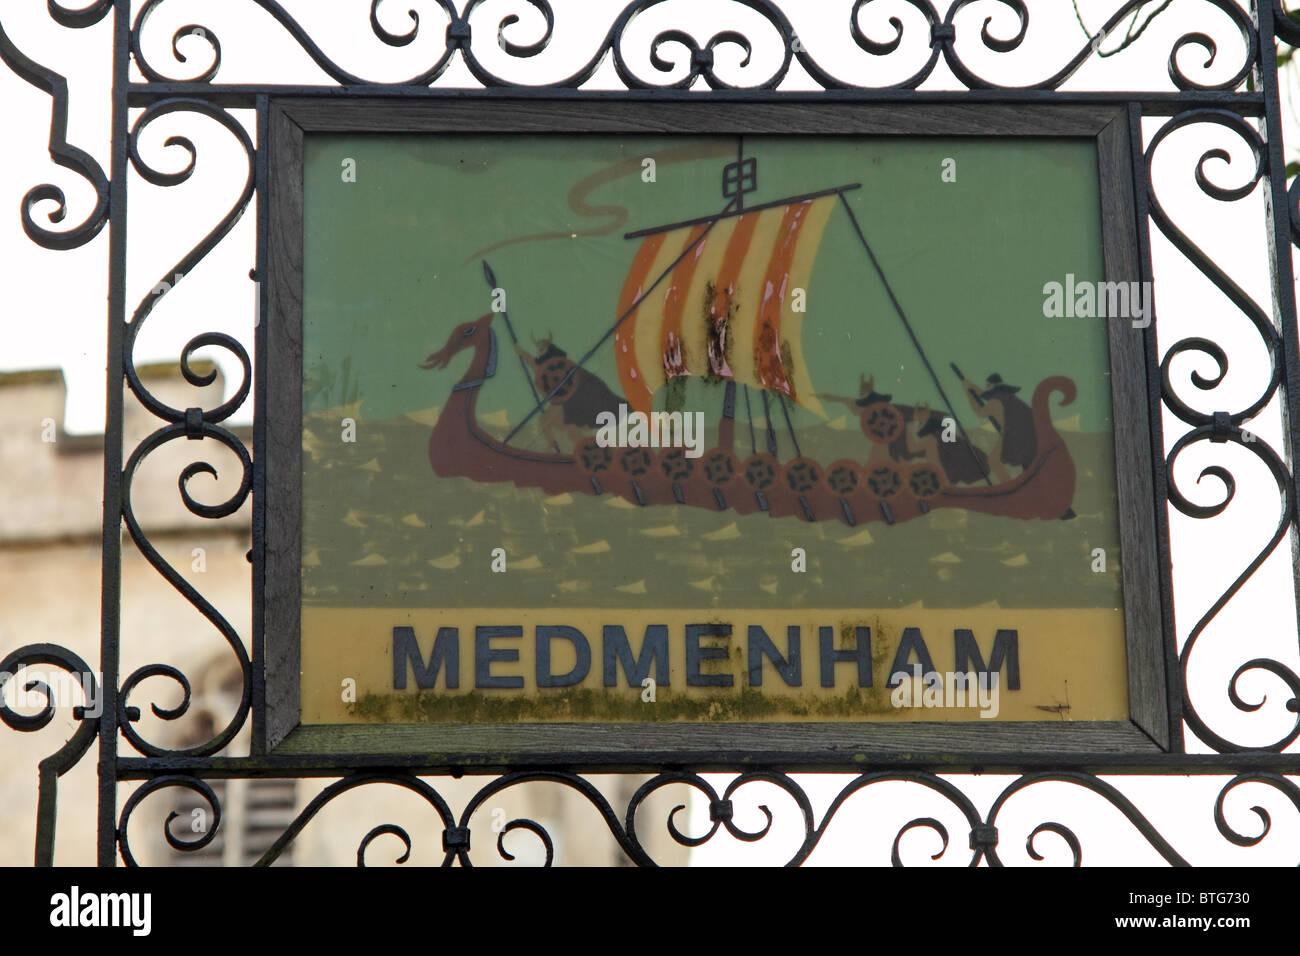 Medmenham, Buckinghamshire, England - the village sign outside the church Stock Photo